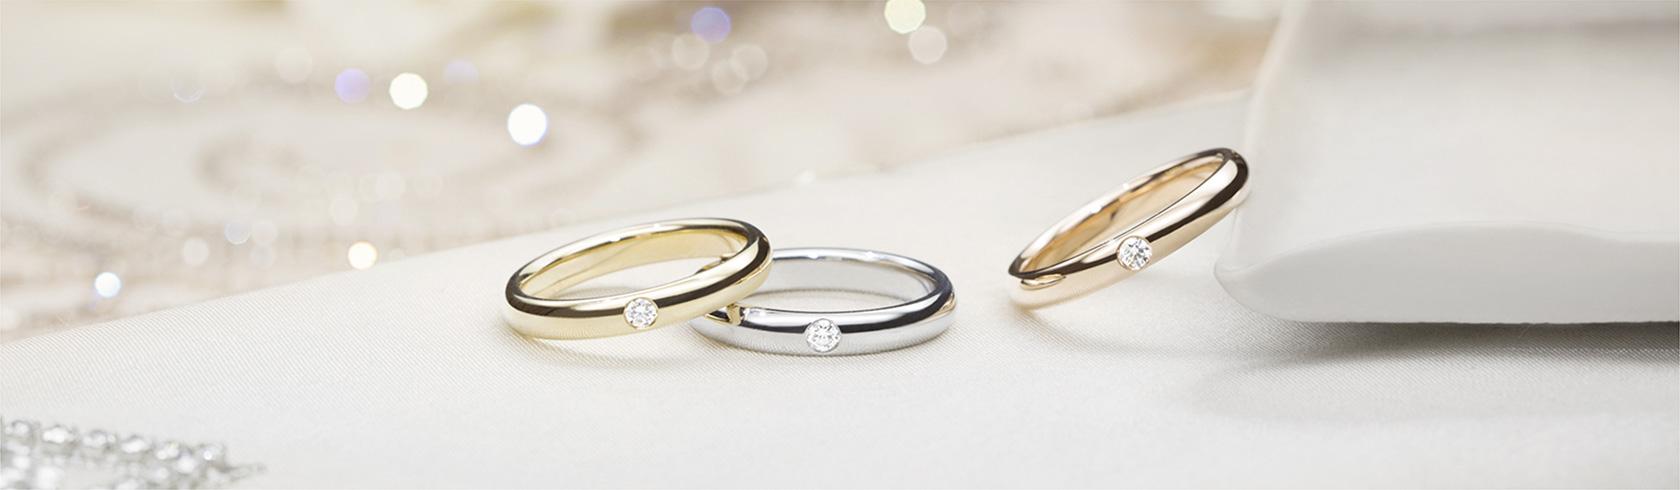 Diamond Wedding Bands | Fine Jewelry | Harry Winston With Regard To 2018 Single Diamond Zalium Wedding Bands (View 7 of 25)